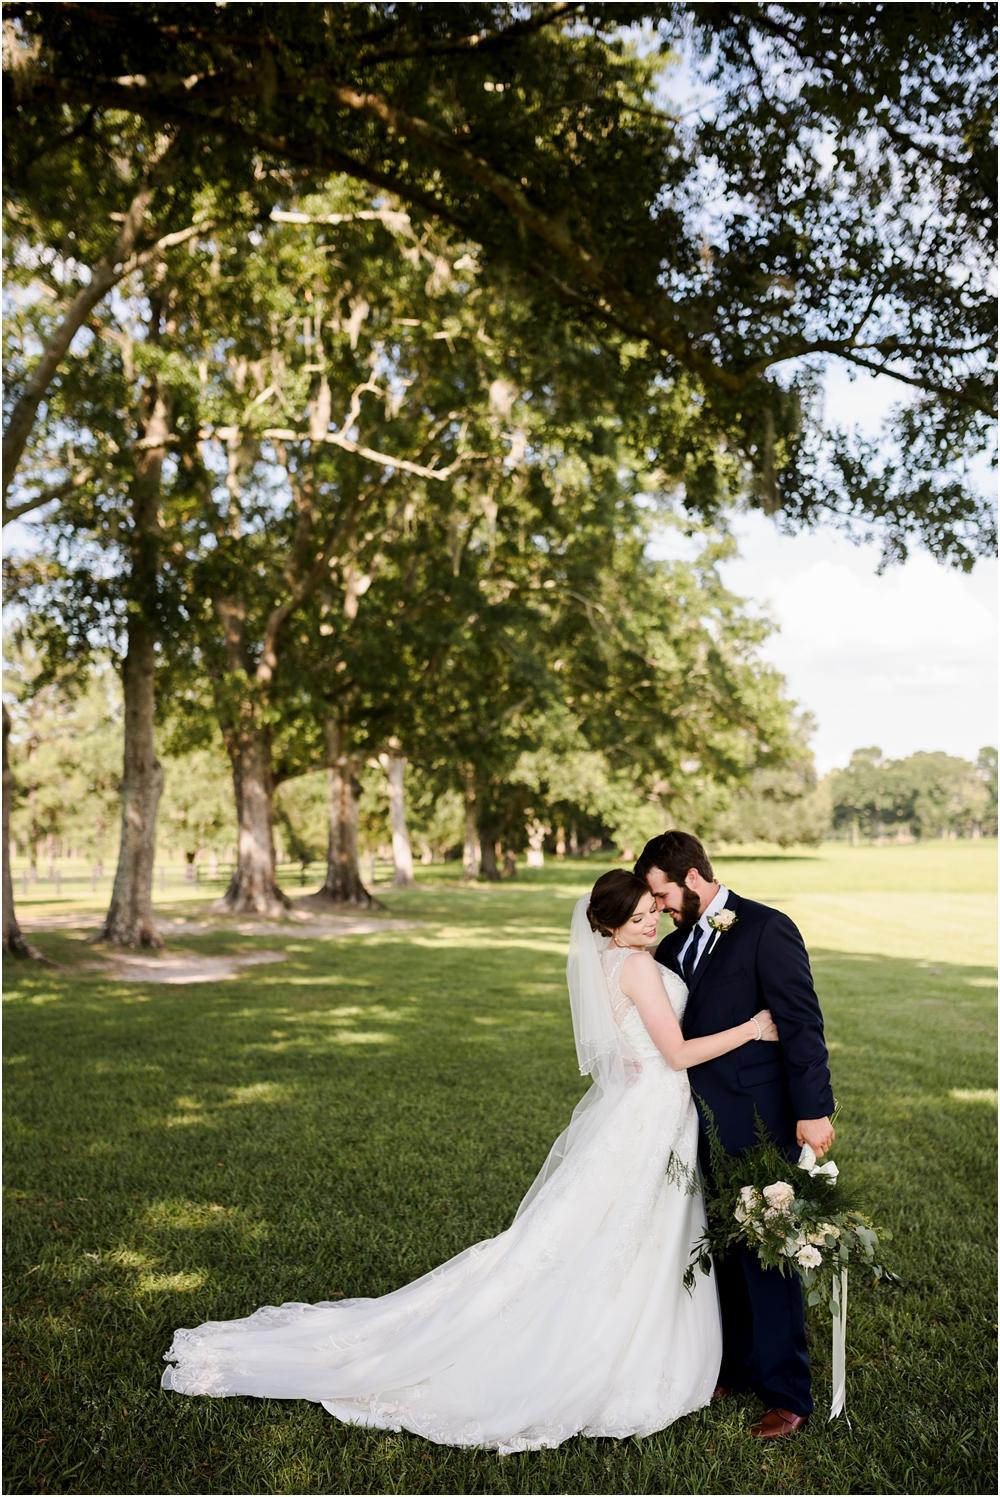 marianna-florida-wedding-photographer-kiersten-grant-67.jpg